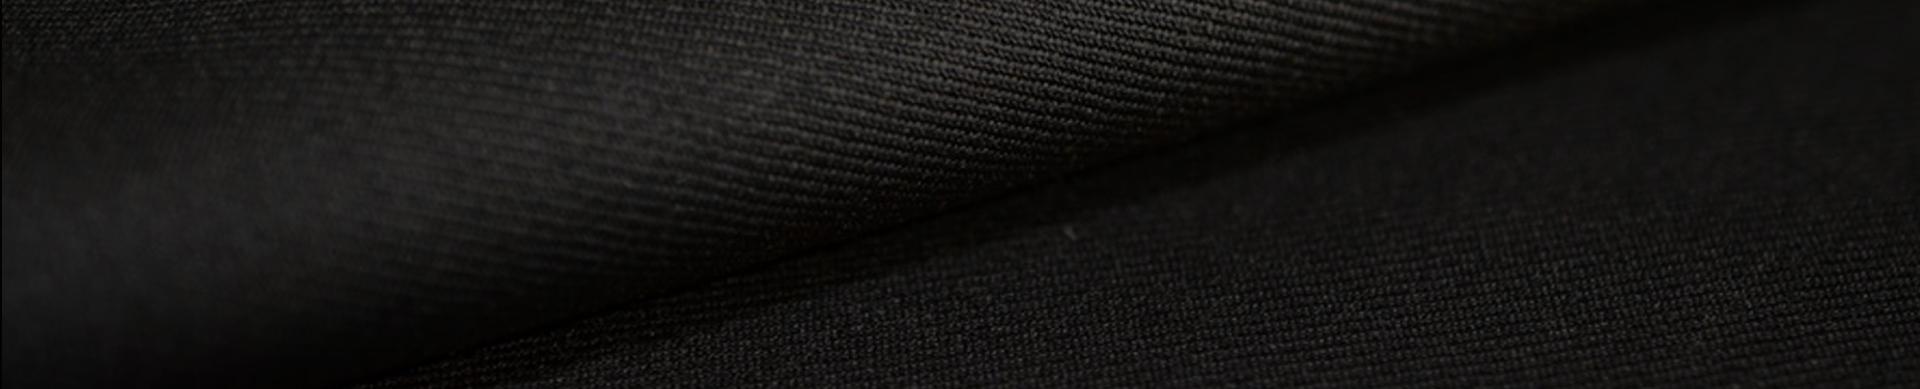 close up of cloth